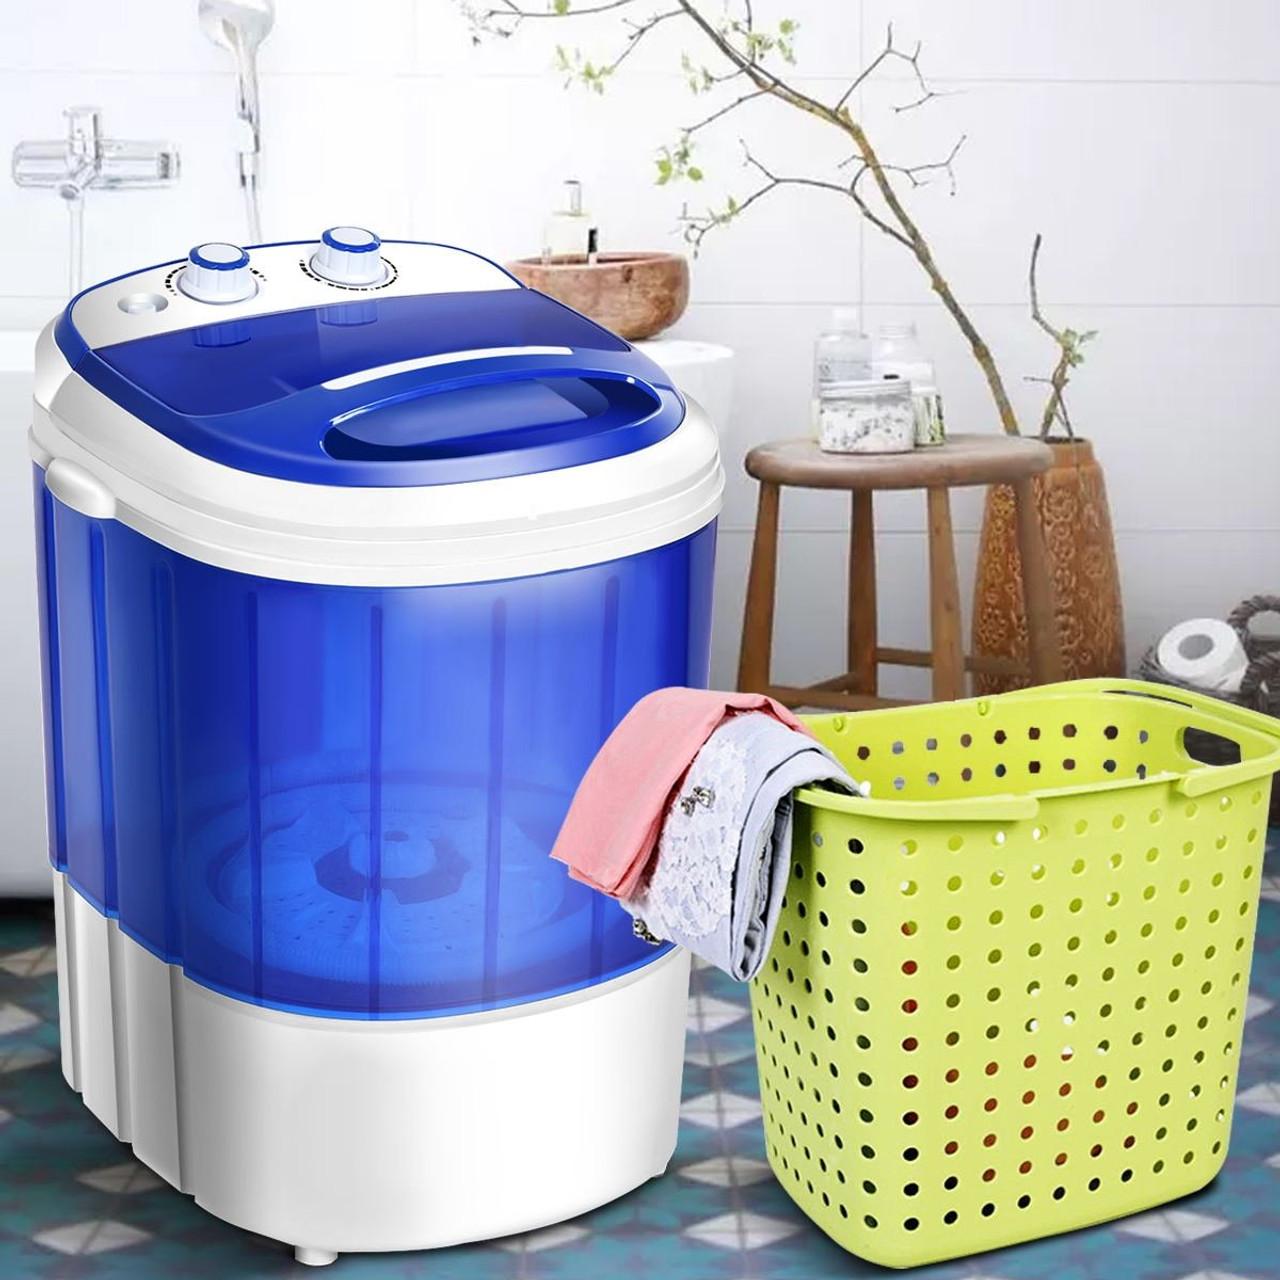 CW EP24516 Mini Electric Compact Portable Durable Laundry Washing Machine Washer